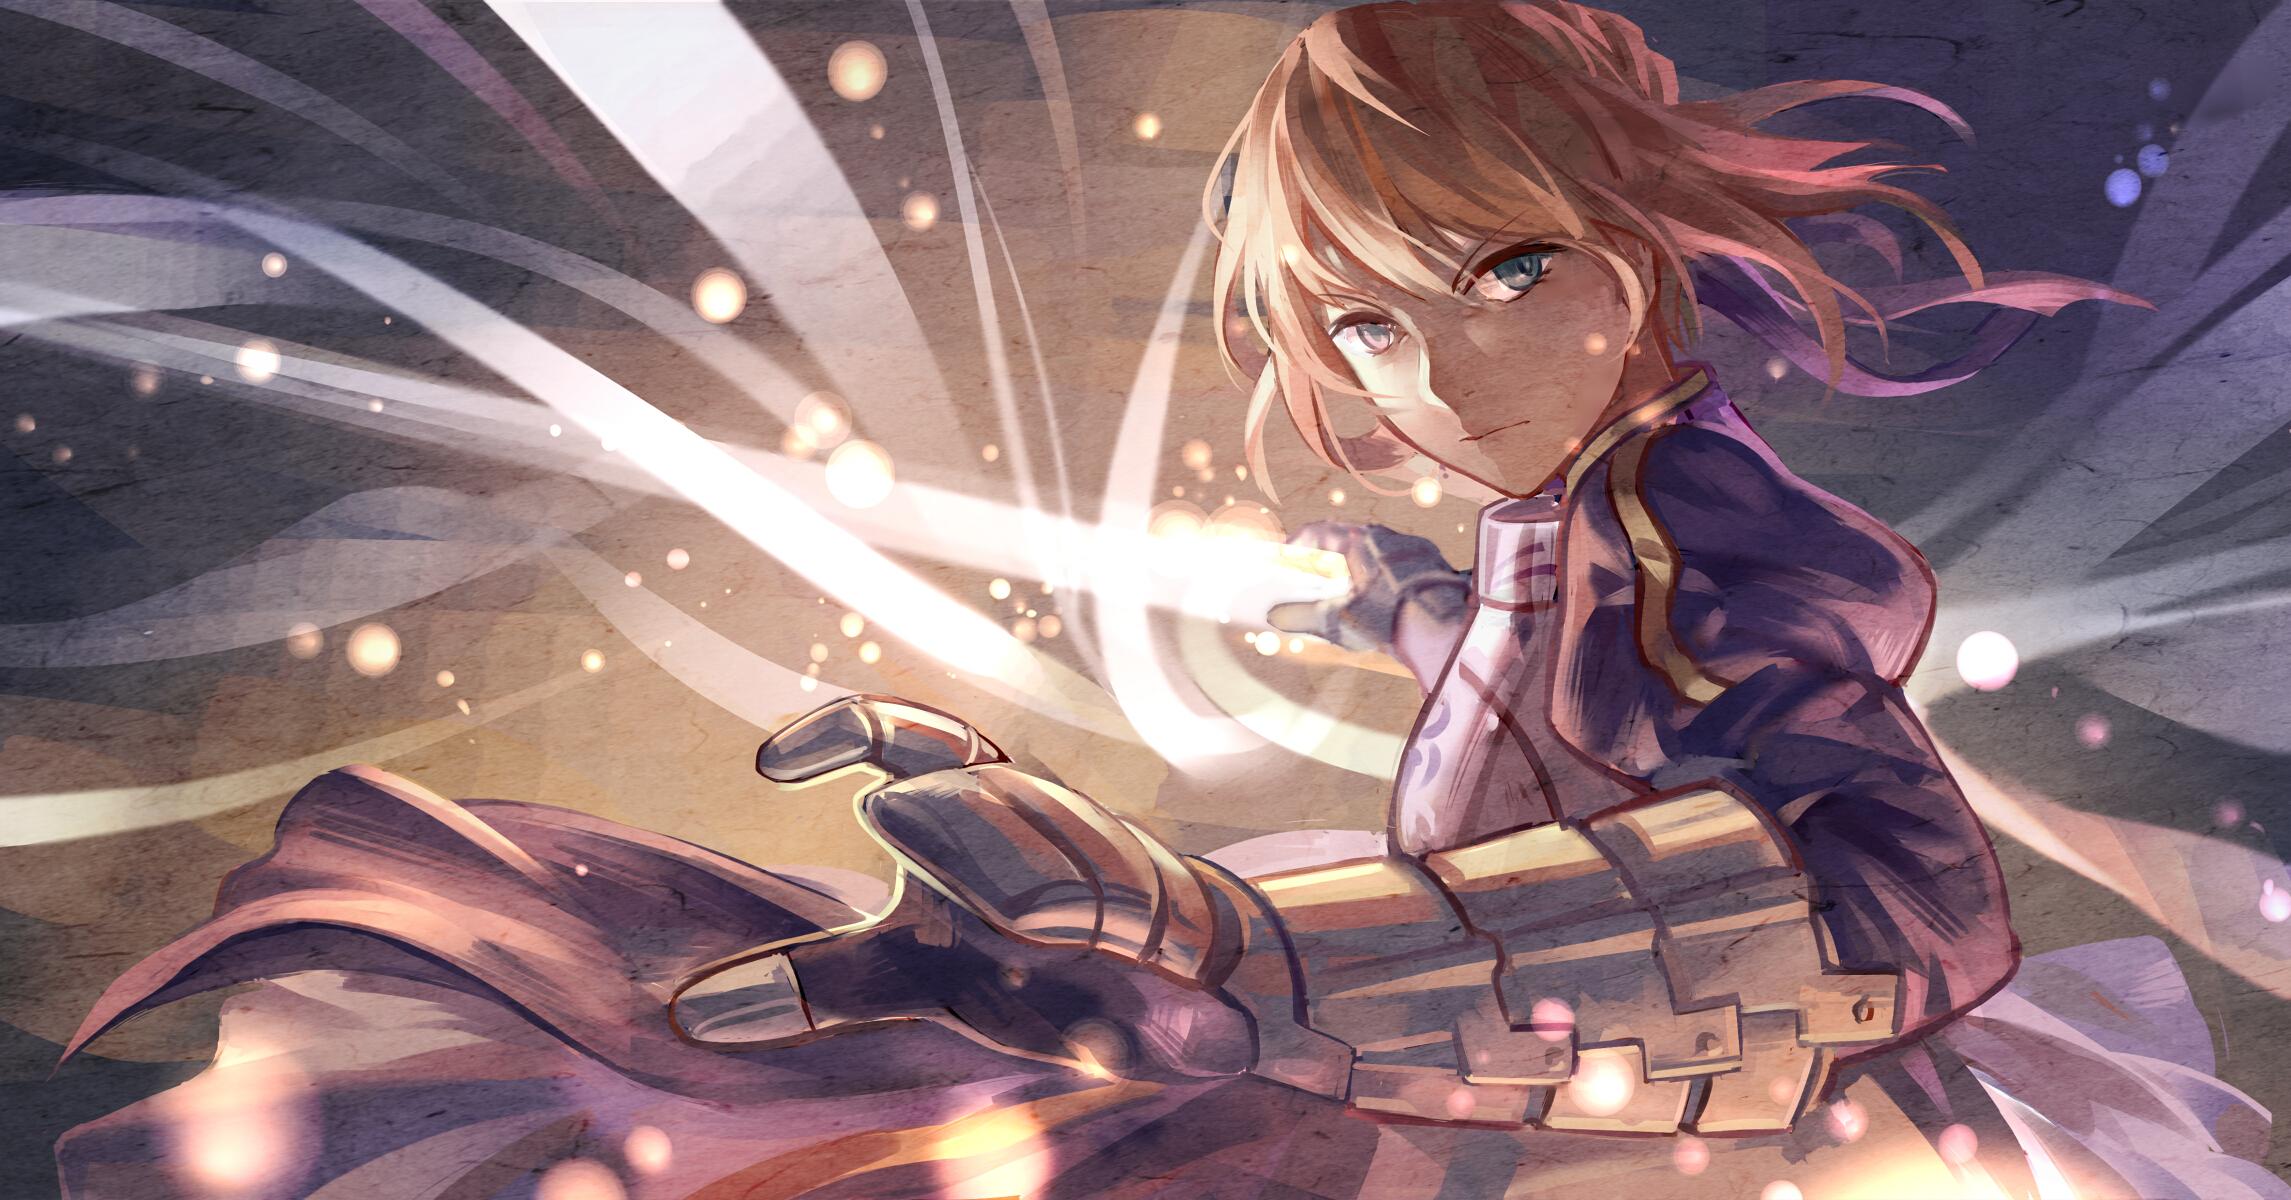 Saber Fate Stay Night Hd Wallpaper 1818946 Zerochan Anime Image Board Mobile